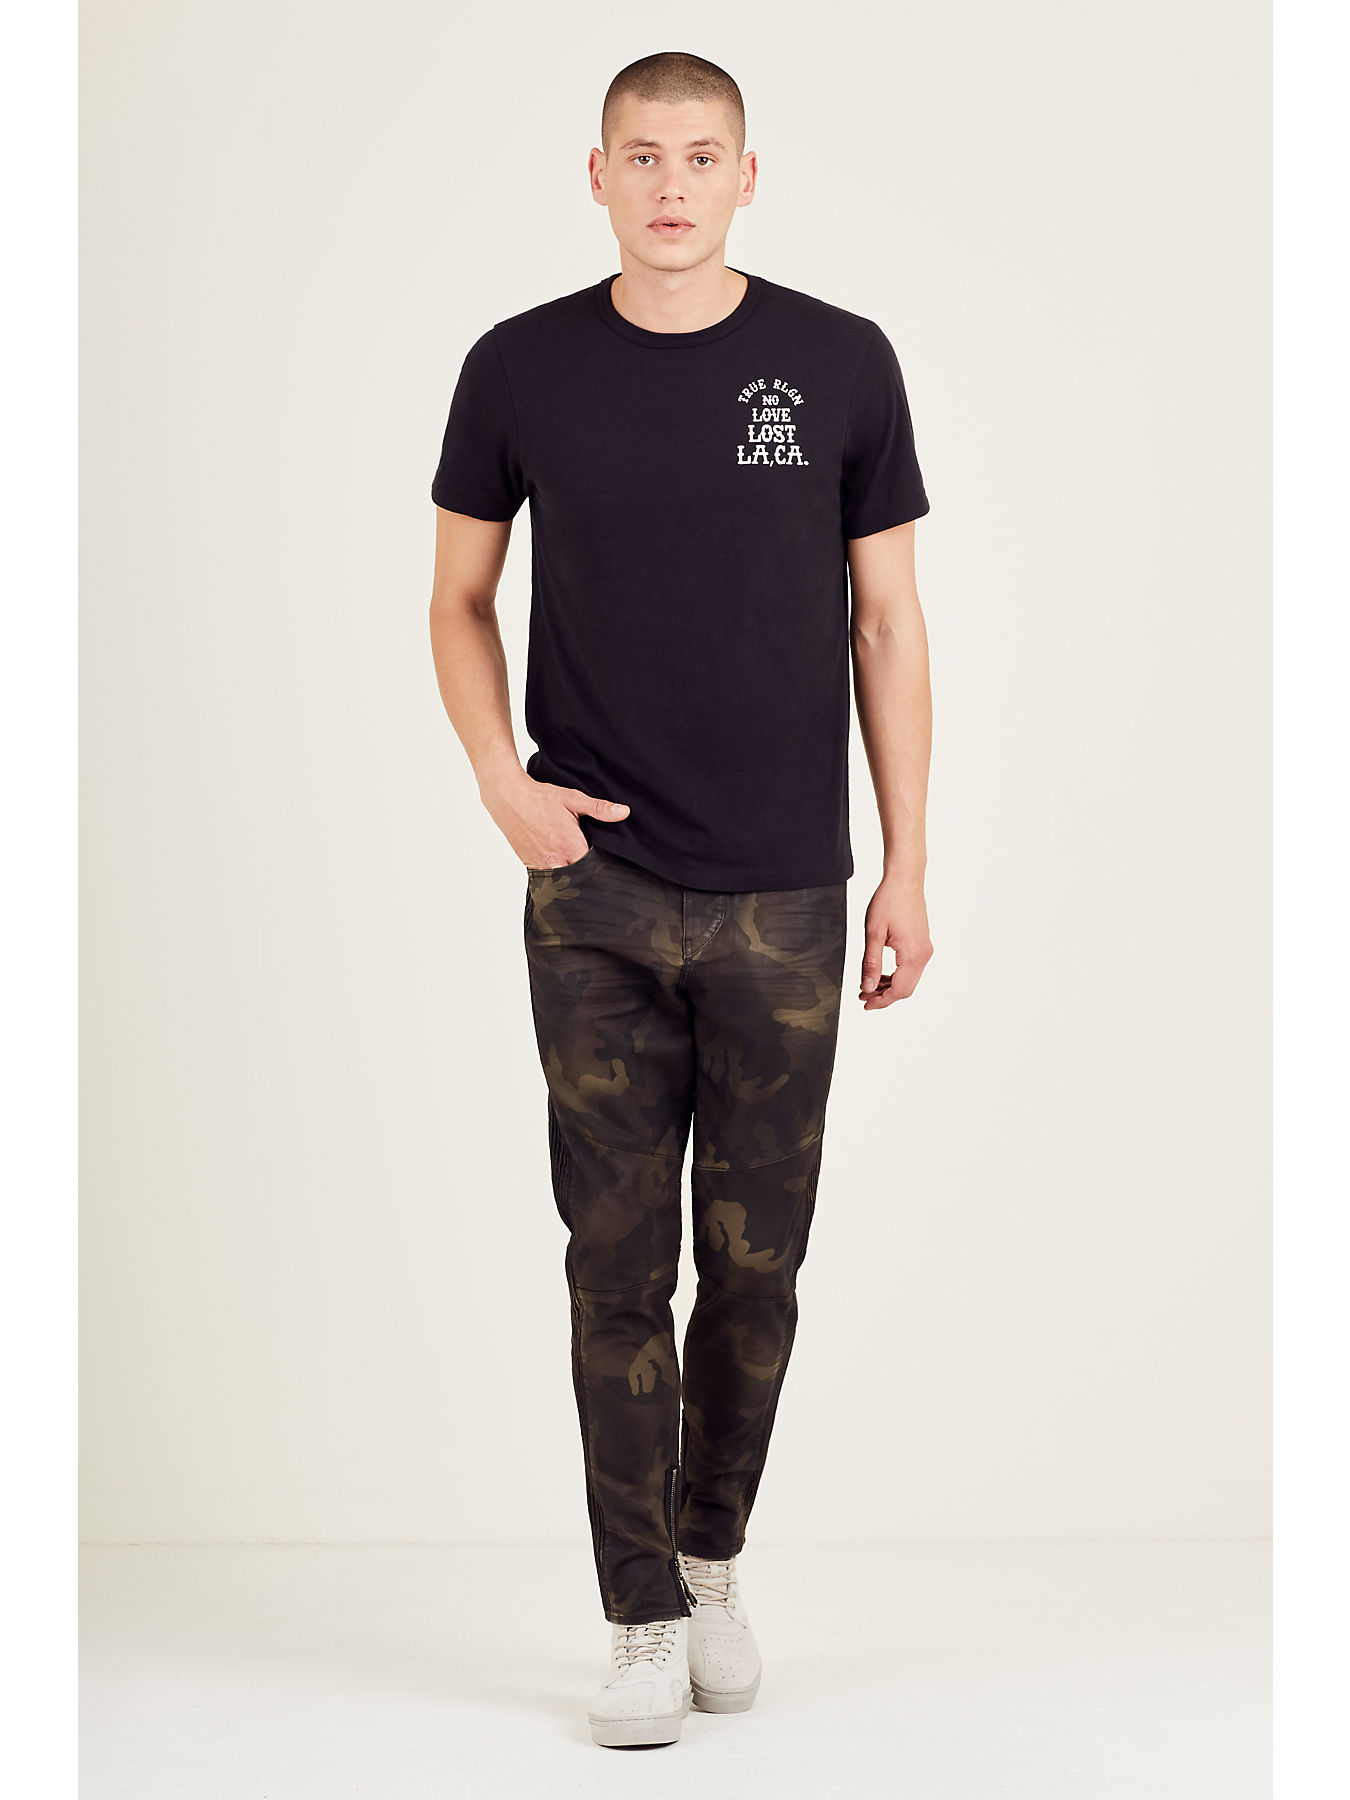 aab02a43 Ricky Skinny Jean - Men's Camo Jeans | True Religion